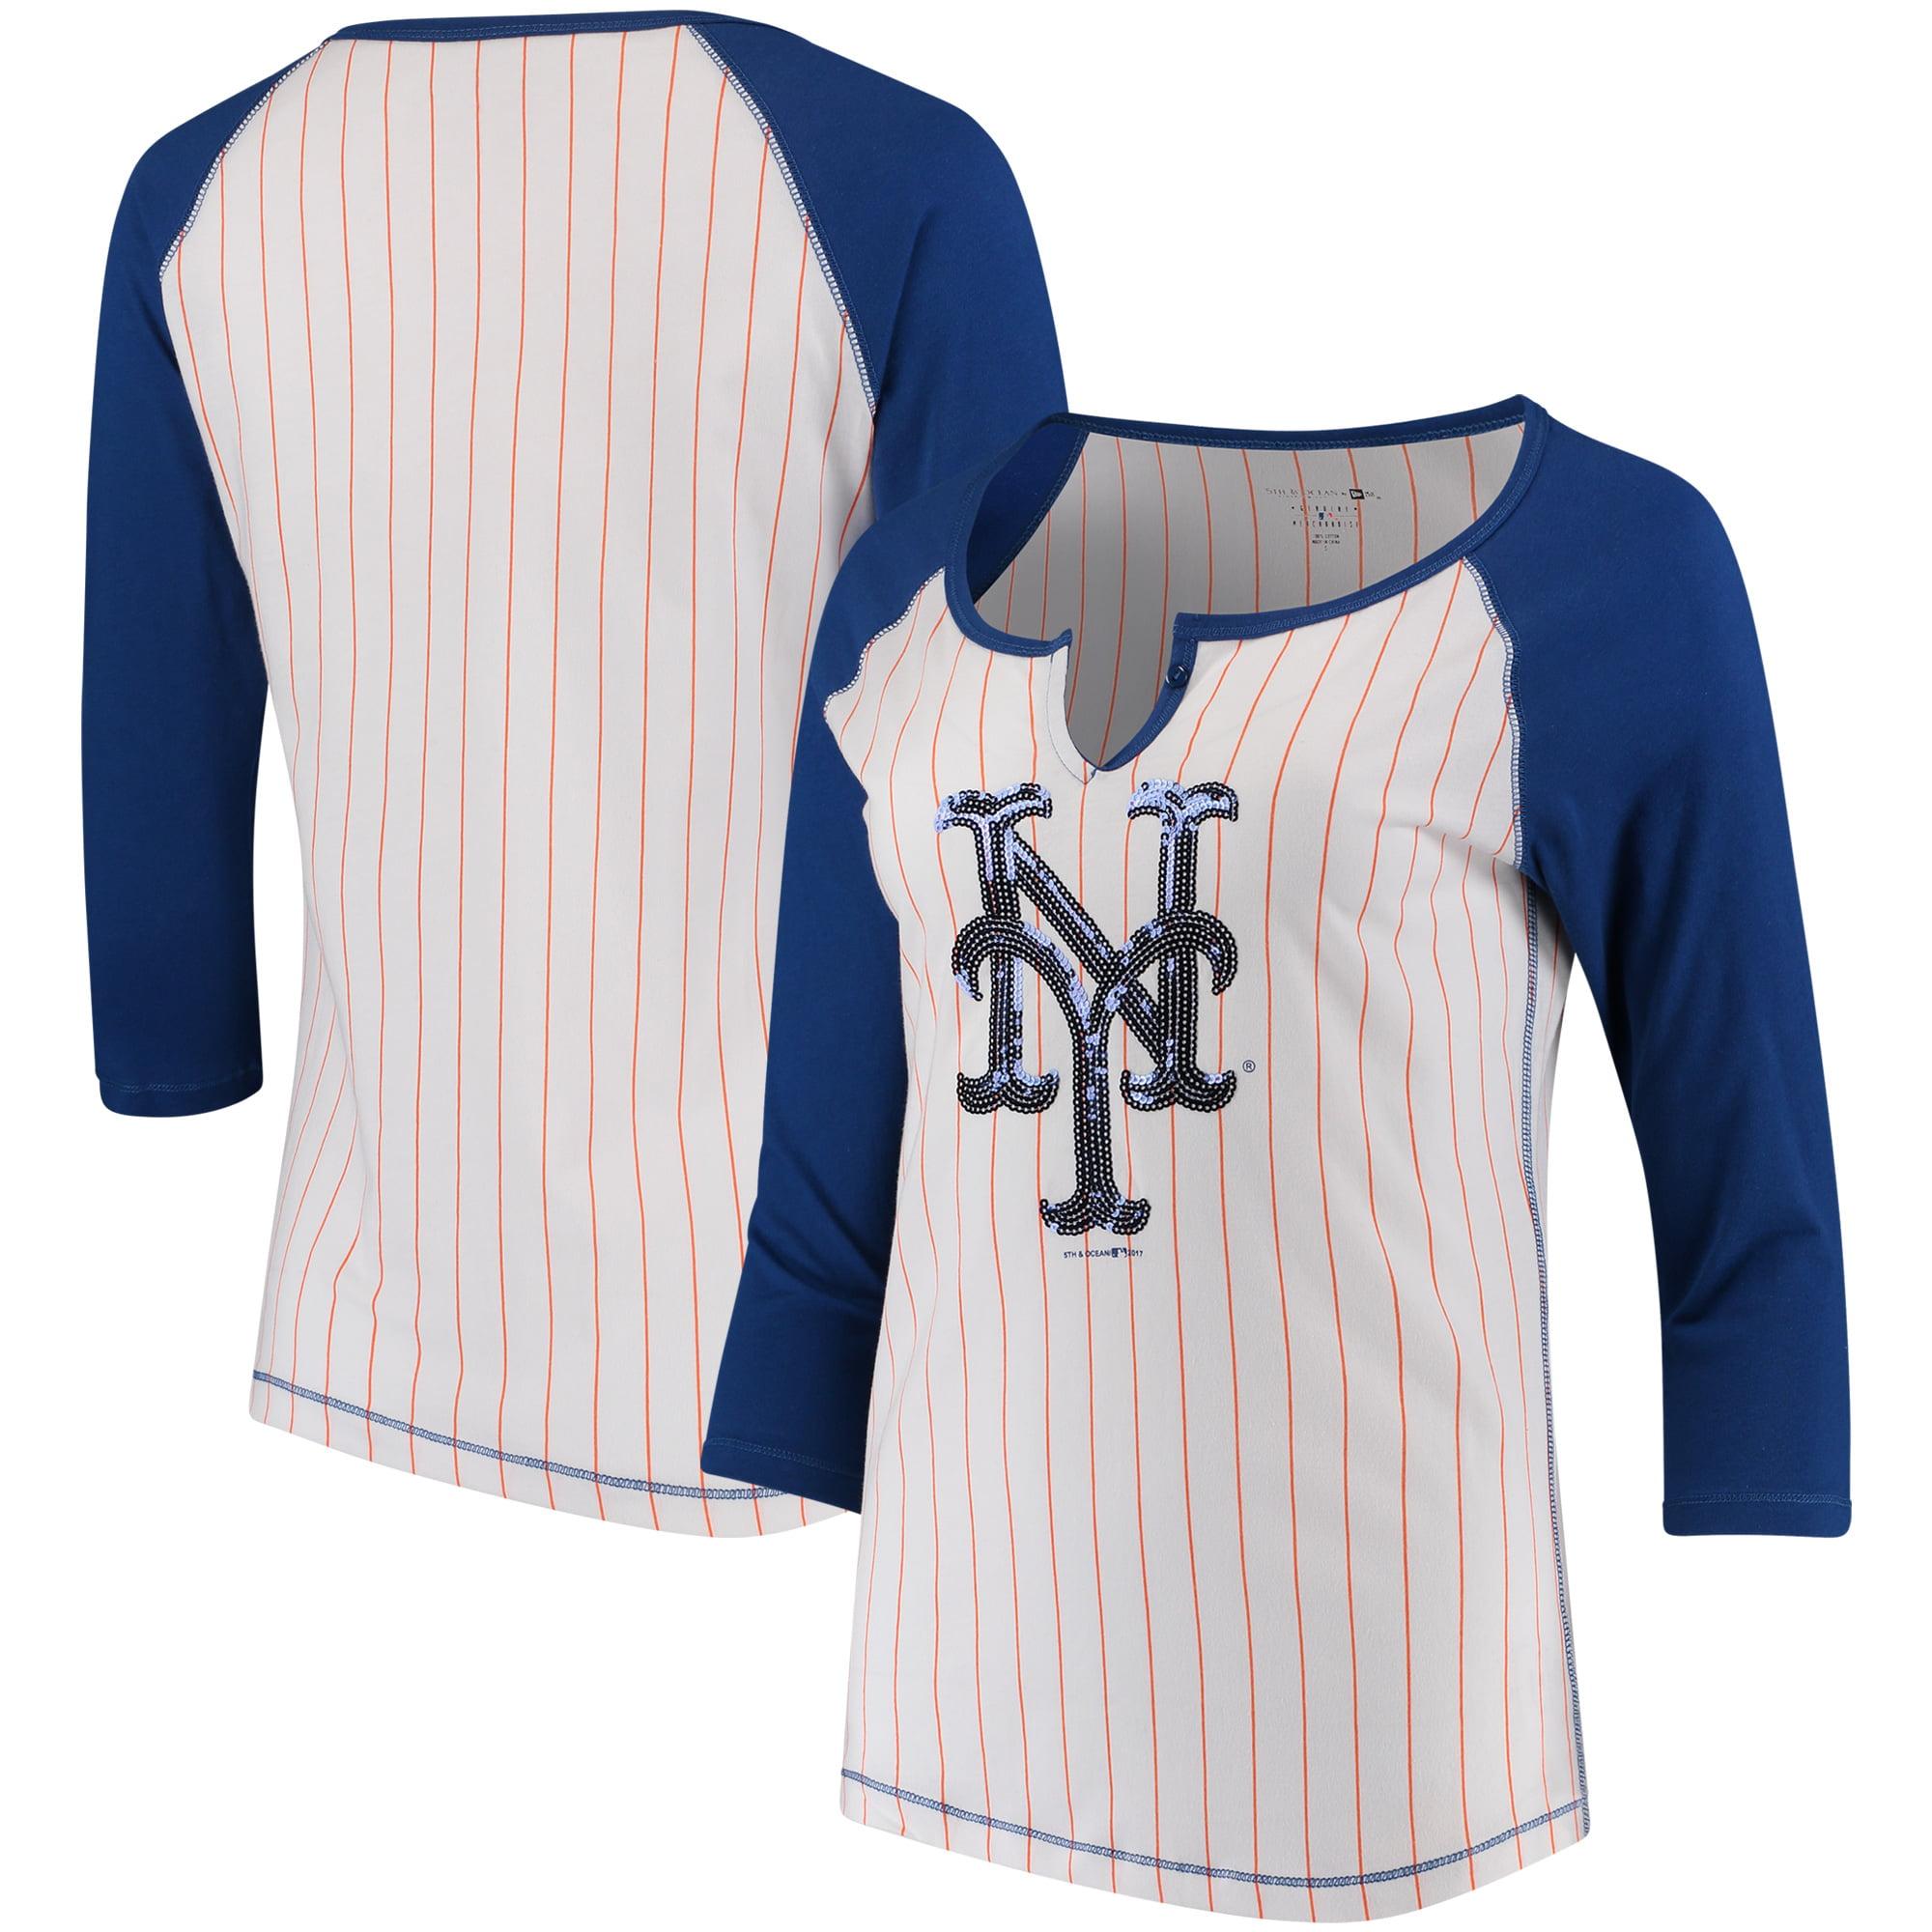 New York Mets 5th & Ocean by New Era Women's Pinstripe 3/4-Sleeve Notch Neck Raglan T-Shirt - White/Royal